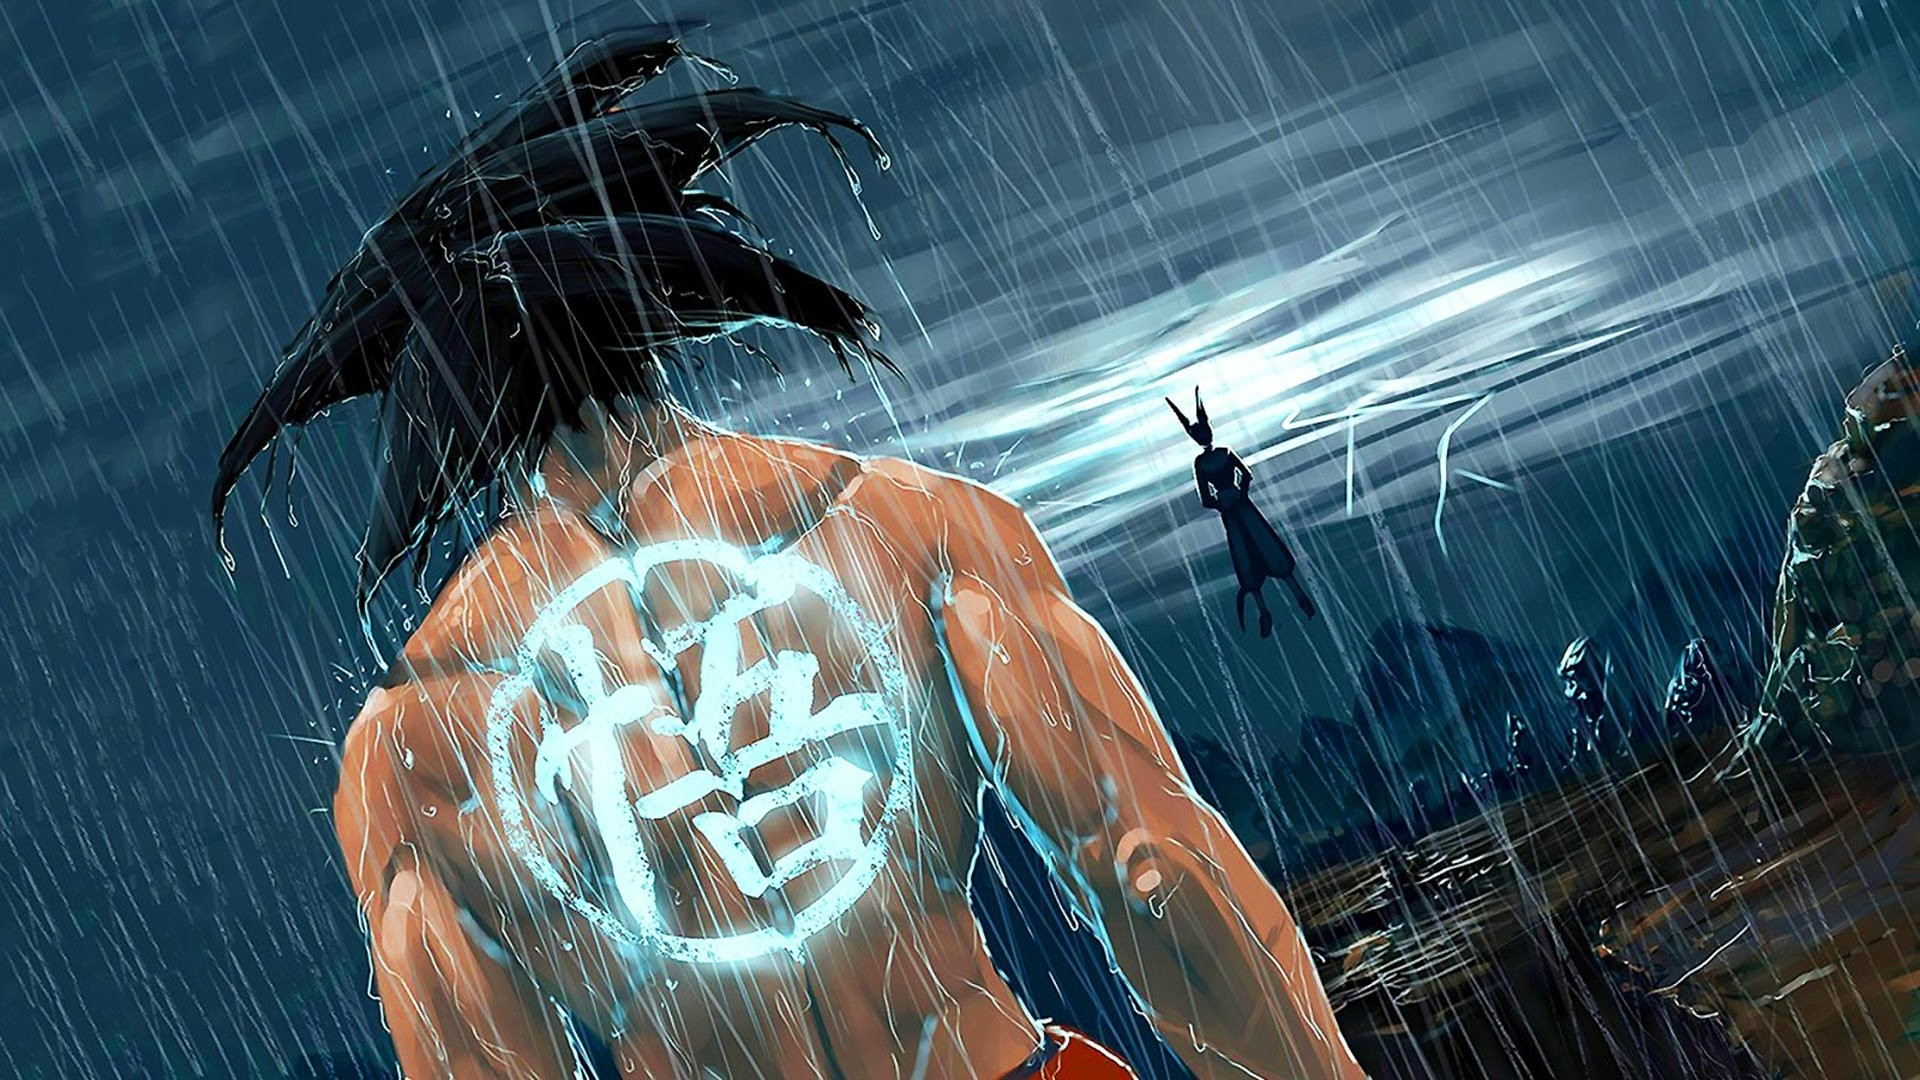 Free Download Goku Dragon Ball Z Picture.